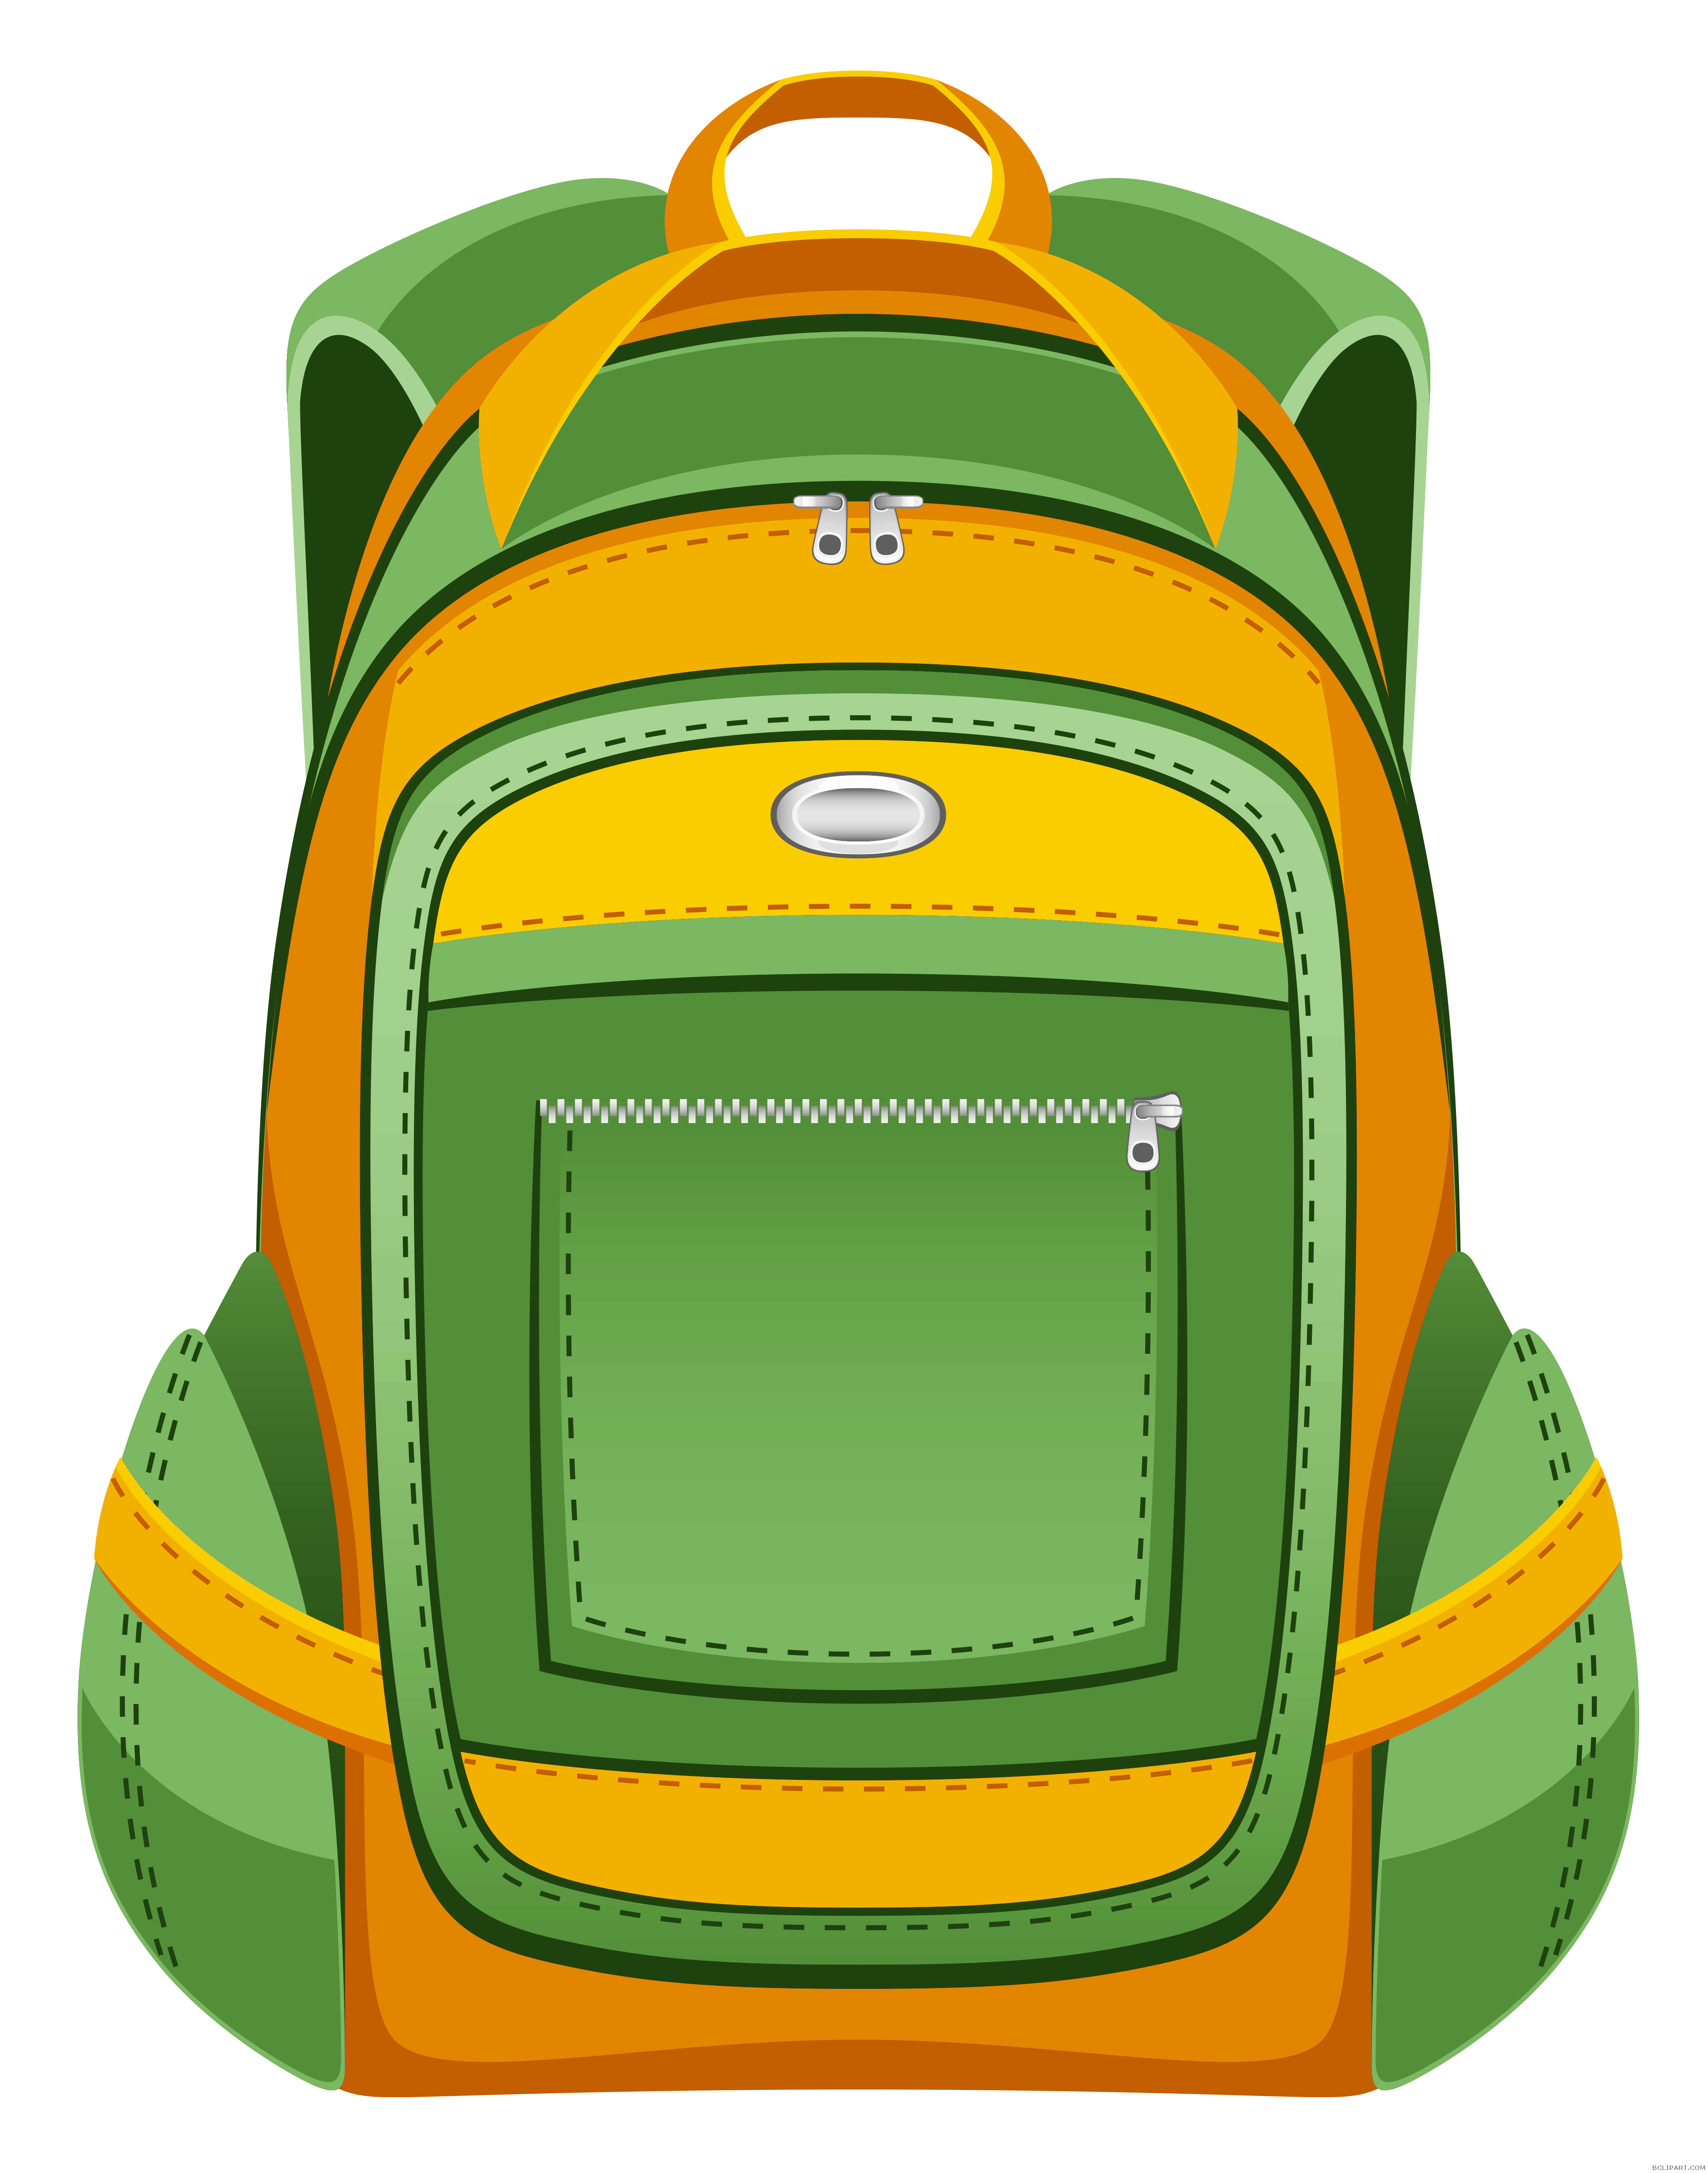 School backpack clipart vector transparent School Backpack Clipart - BClipart vector transparent